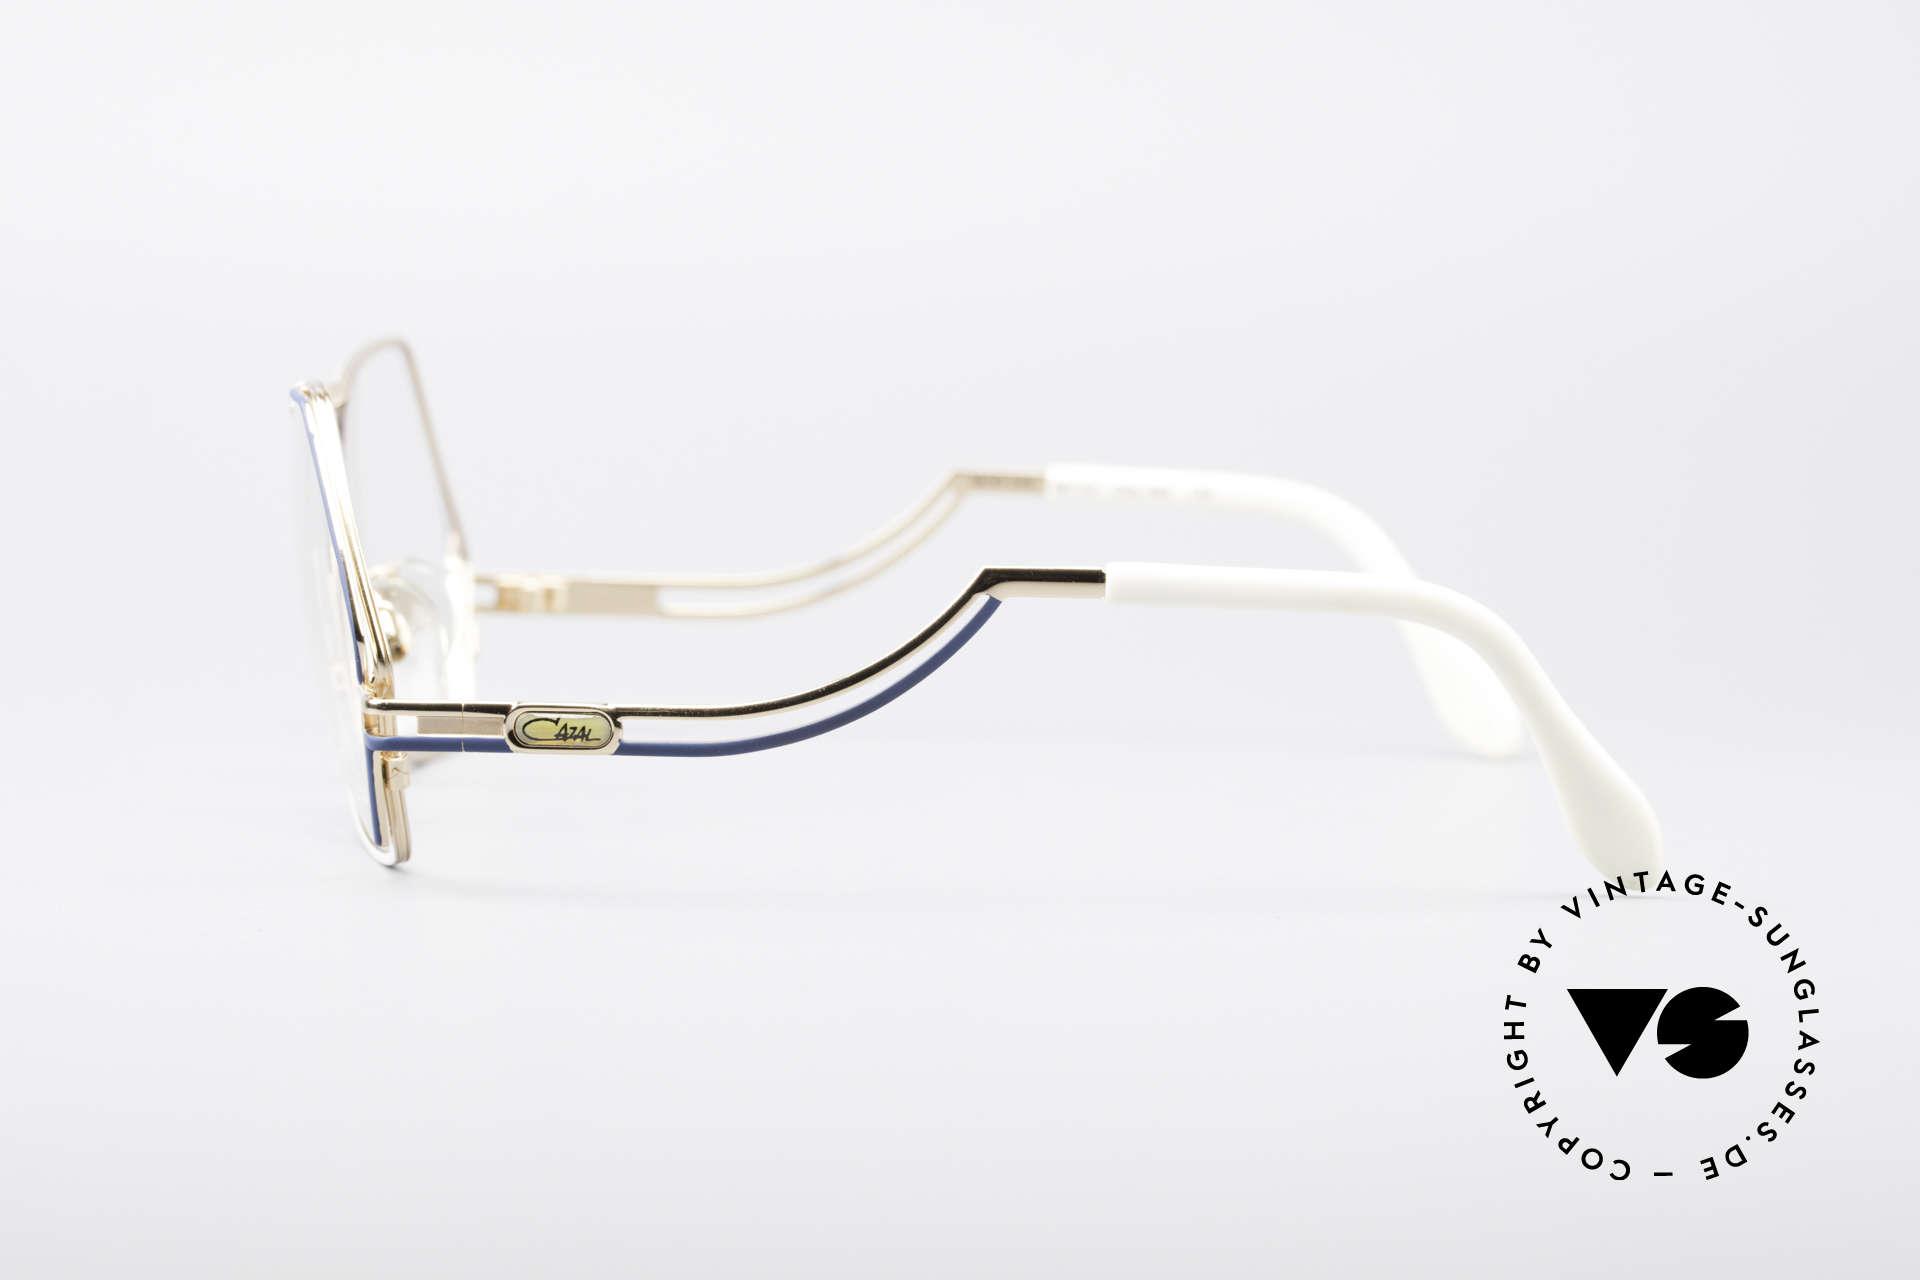 Cazal 226 West Germany Vintage Glasses, NO RETRO EYEGLASSES, but a genuine old ORIGINAL!, Made for Women